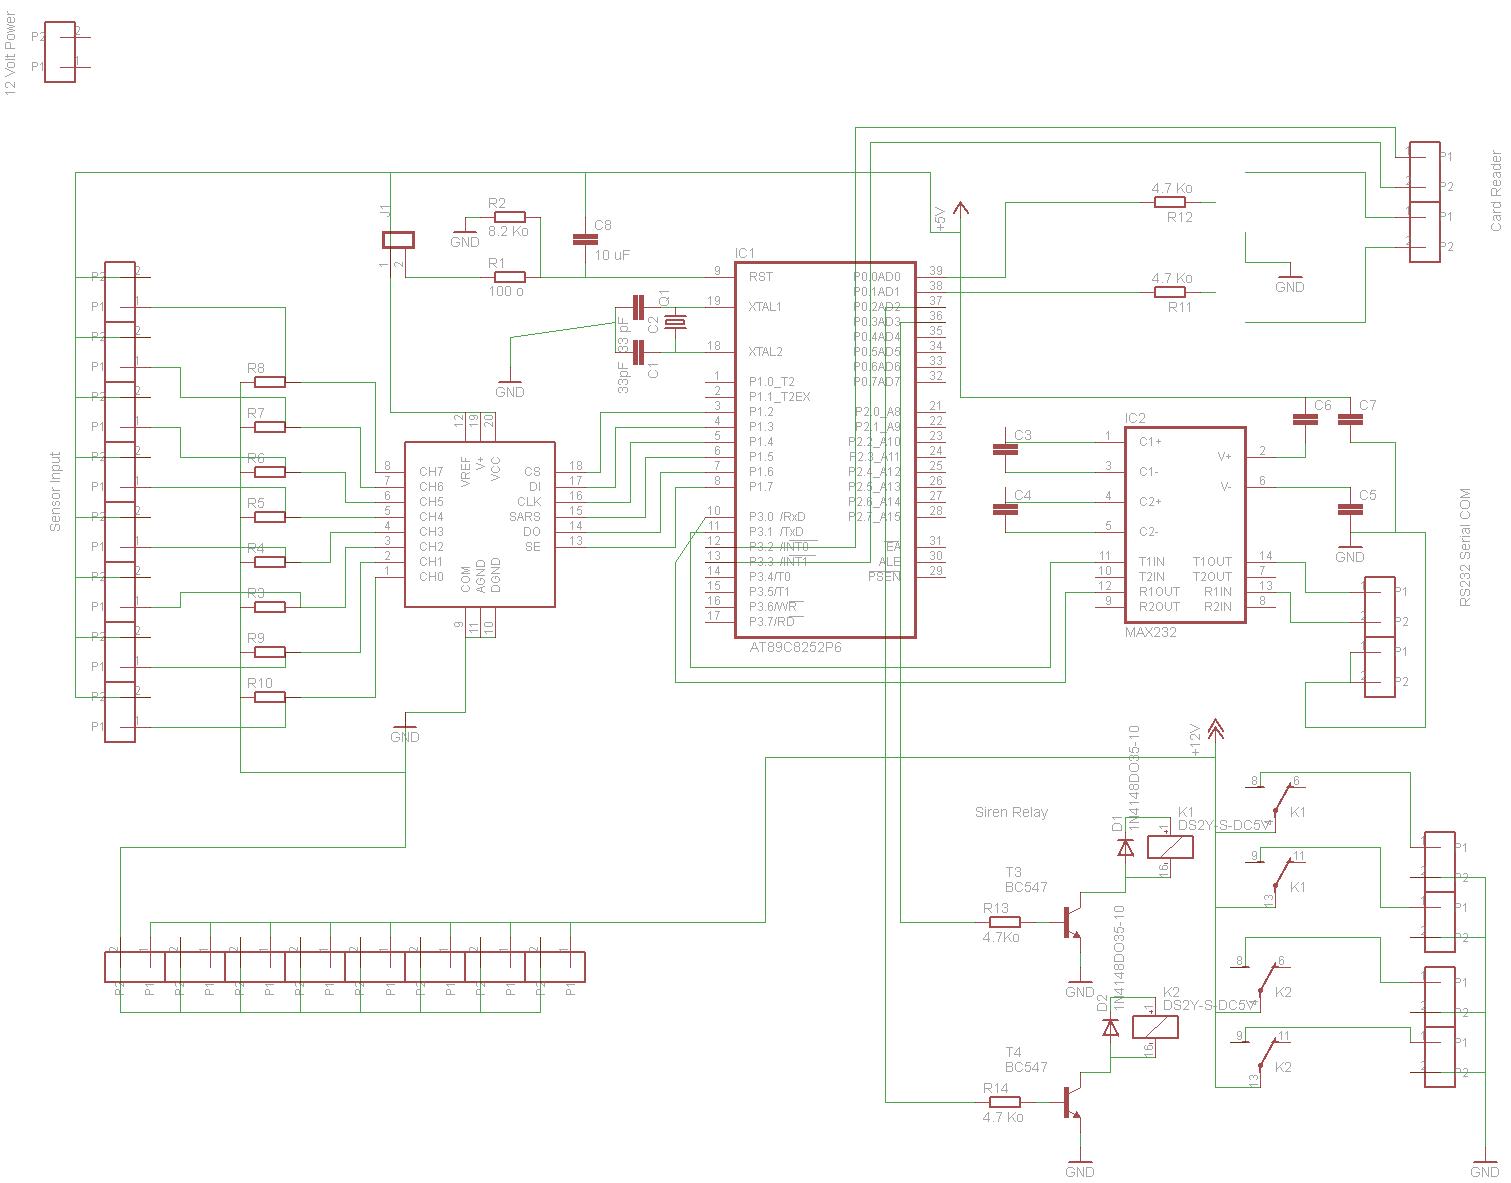 Denso Cdi Box Wiring Diagram - Wiring Diagram G11 on